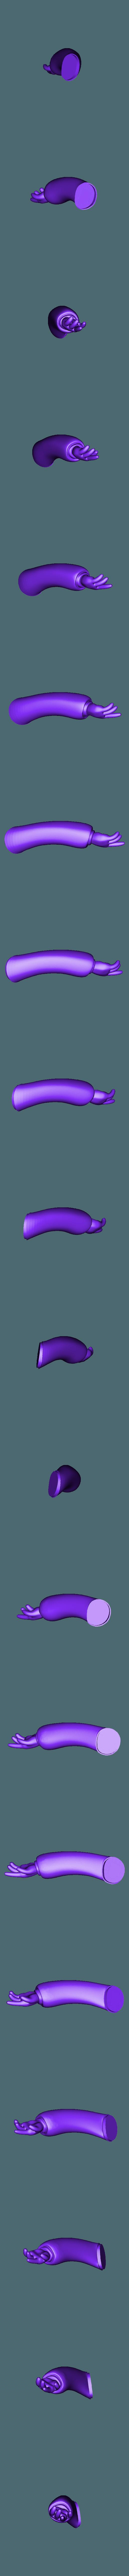 brazo recto.stl Télécharger fichier STL La RFY de Futurama • Objet pour impression 3D, EugenioFructuoso